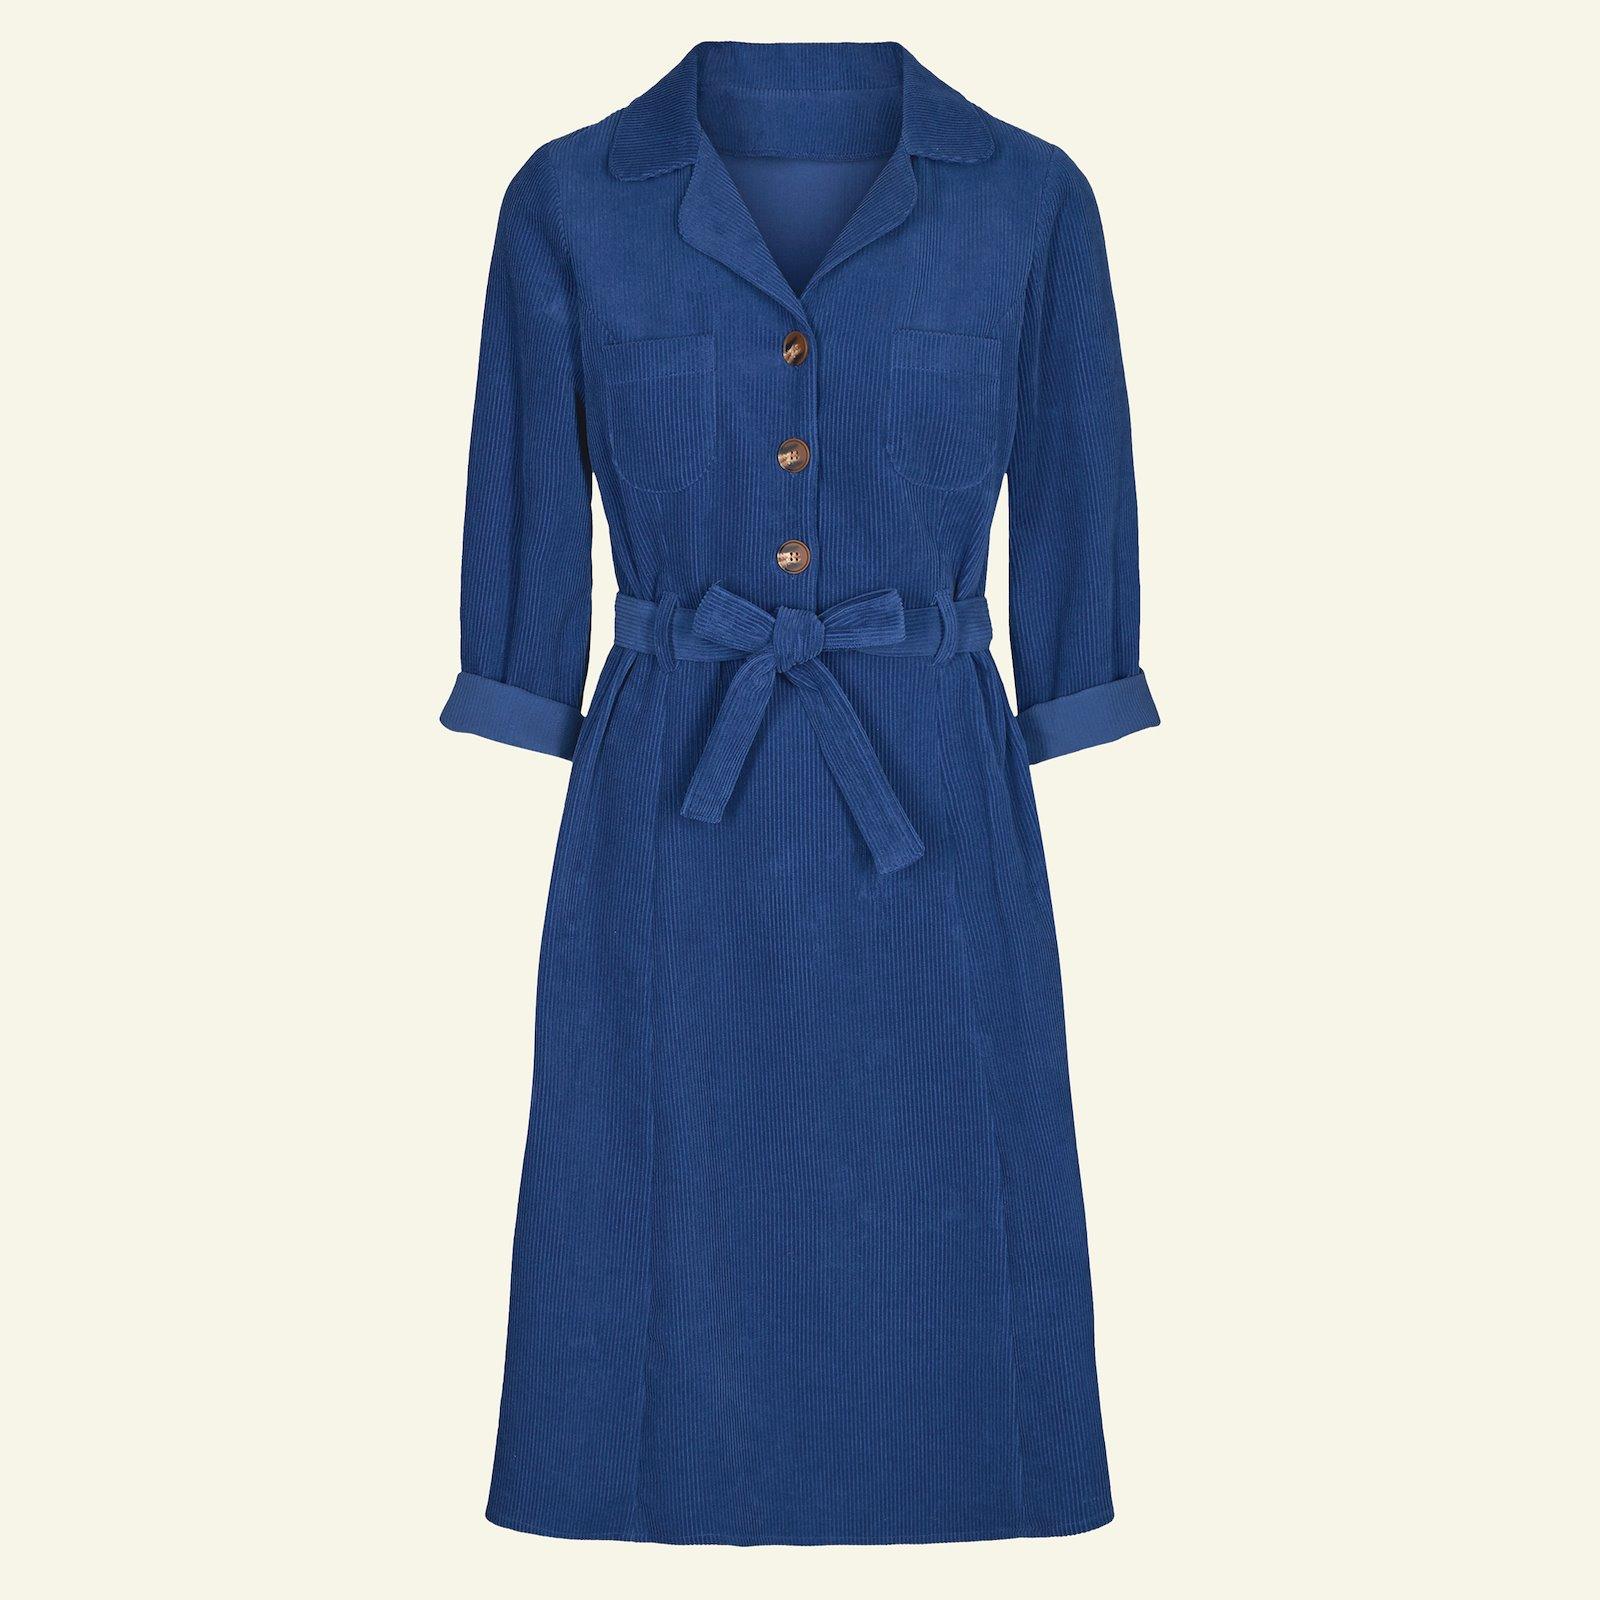 Dress, 46/18 p23075_430820_40243_sskit